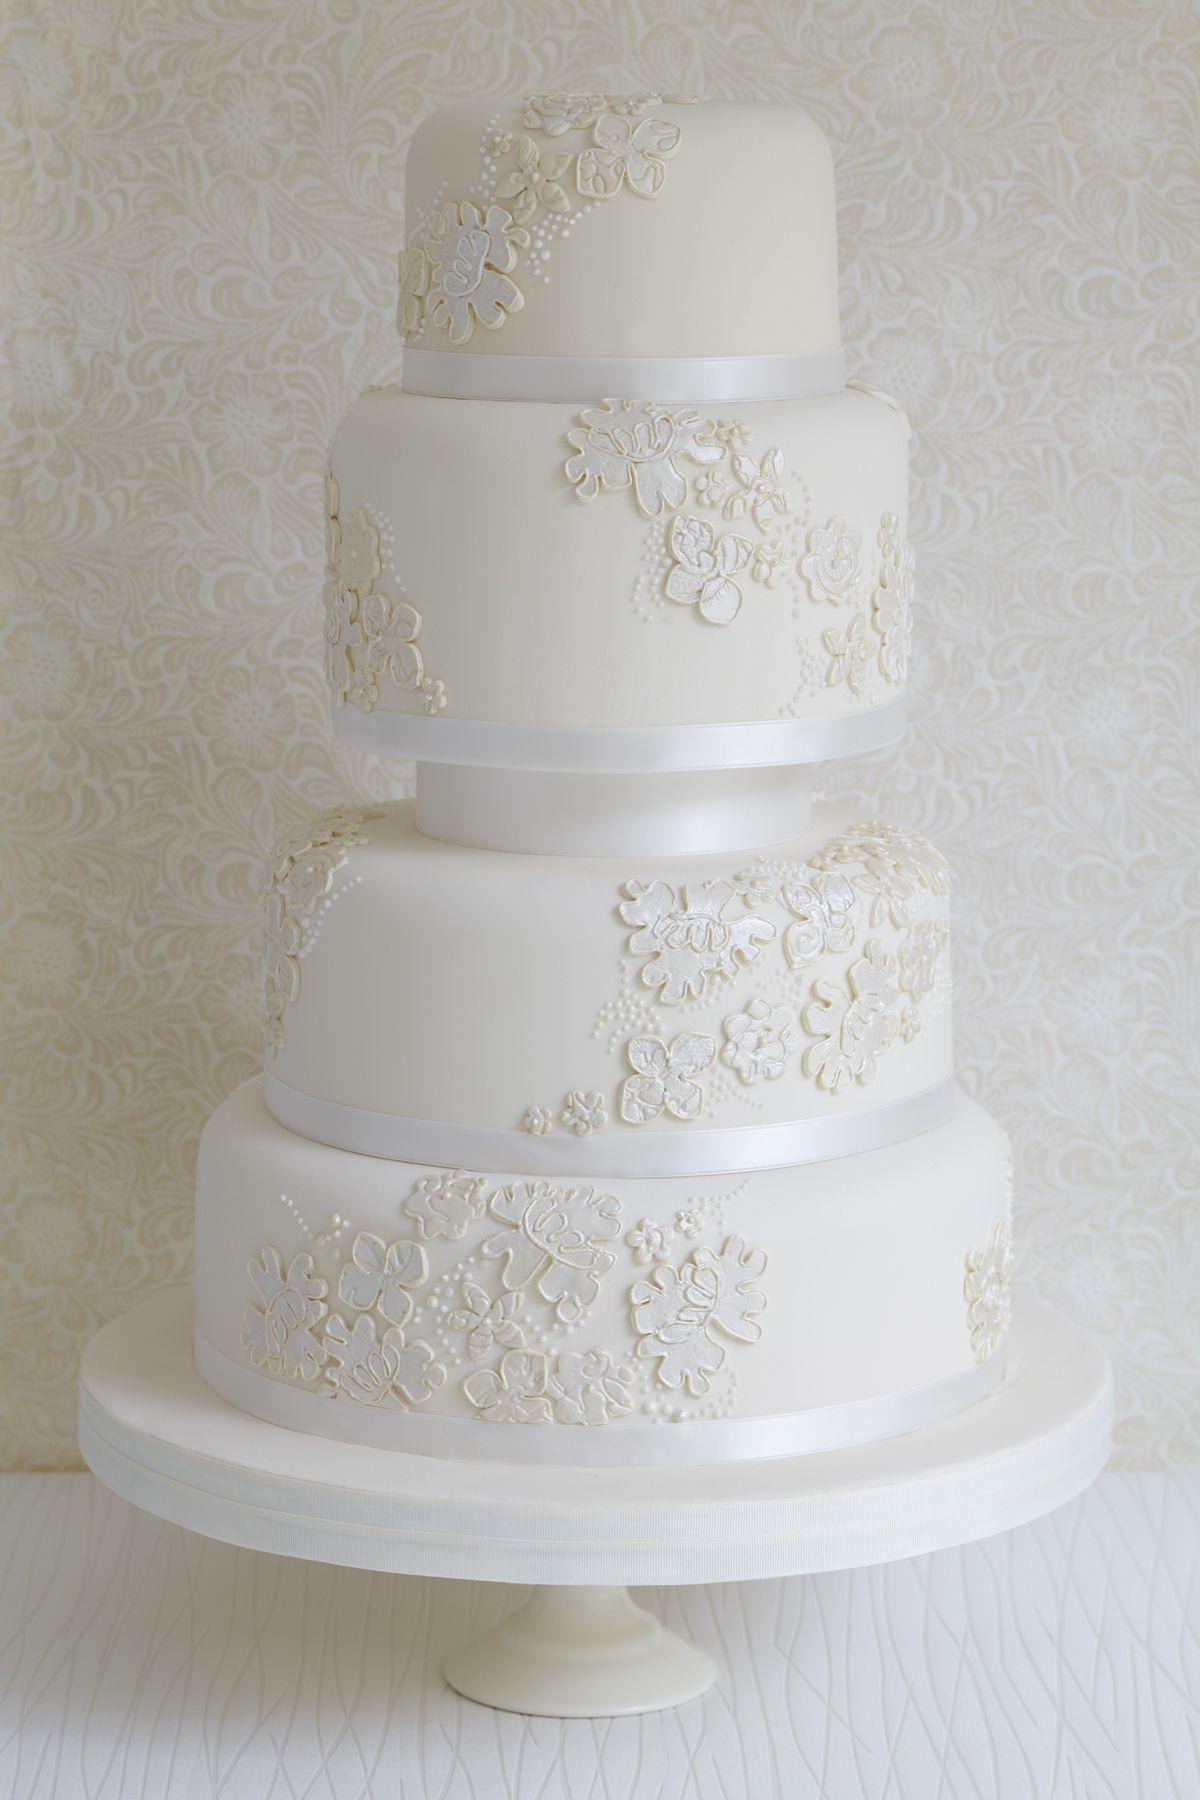 Pin by Alissa on White Textured Wedding Cake | Pinterest | Wedding ...